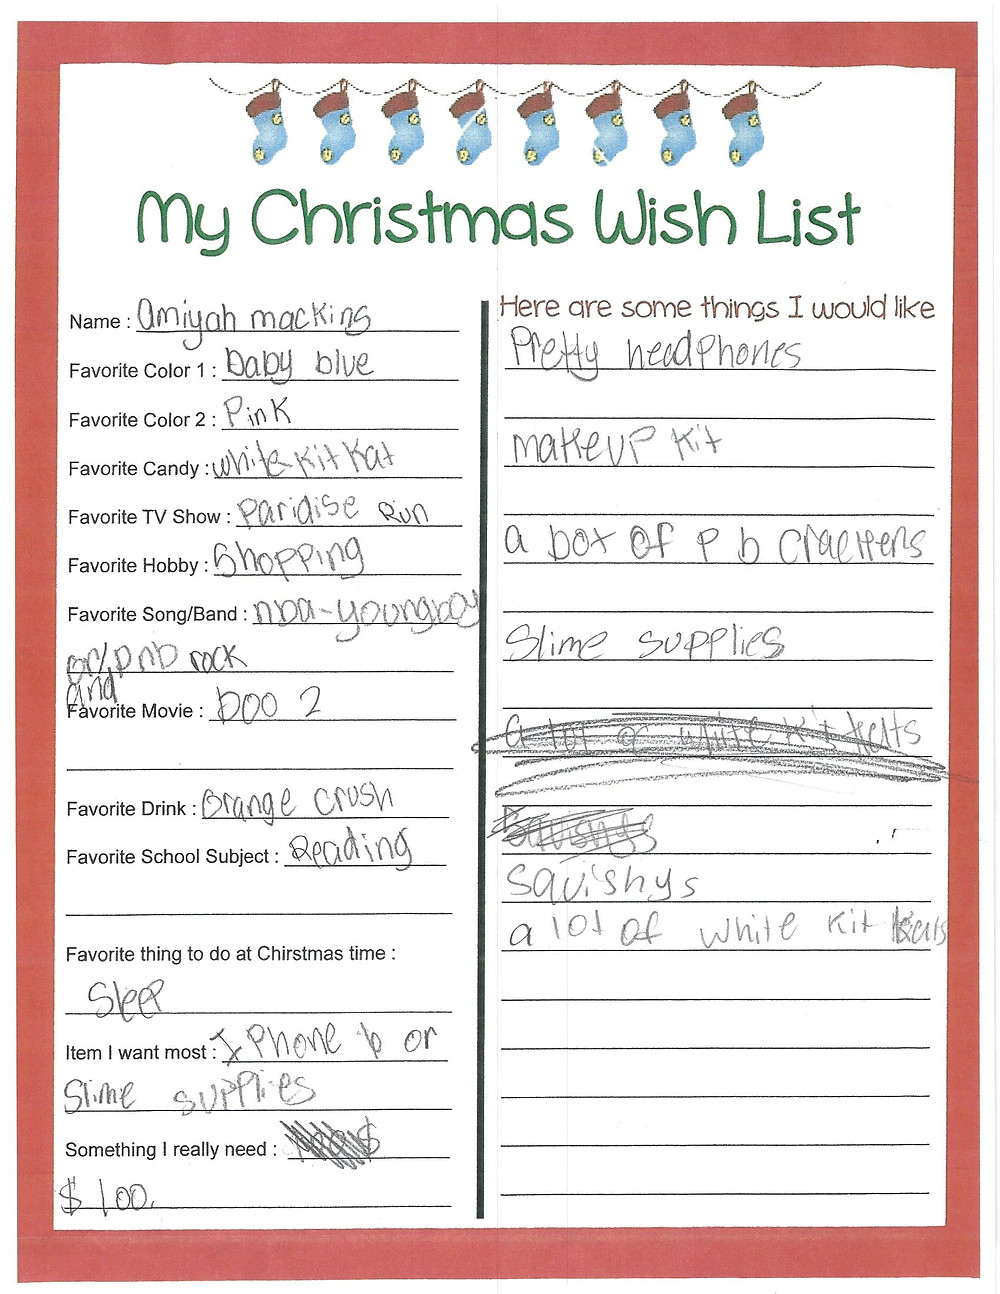 Amiyah's Christmas Wish List